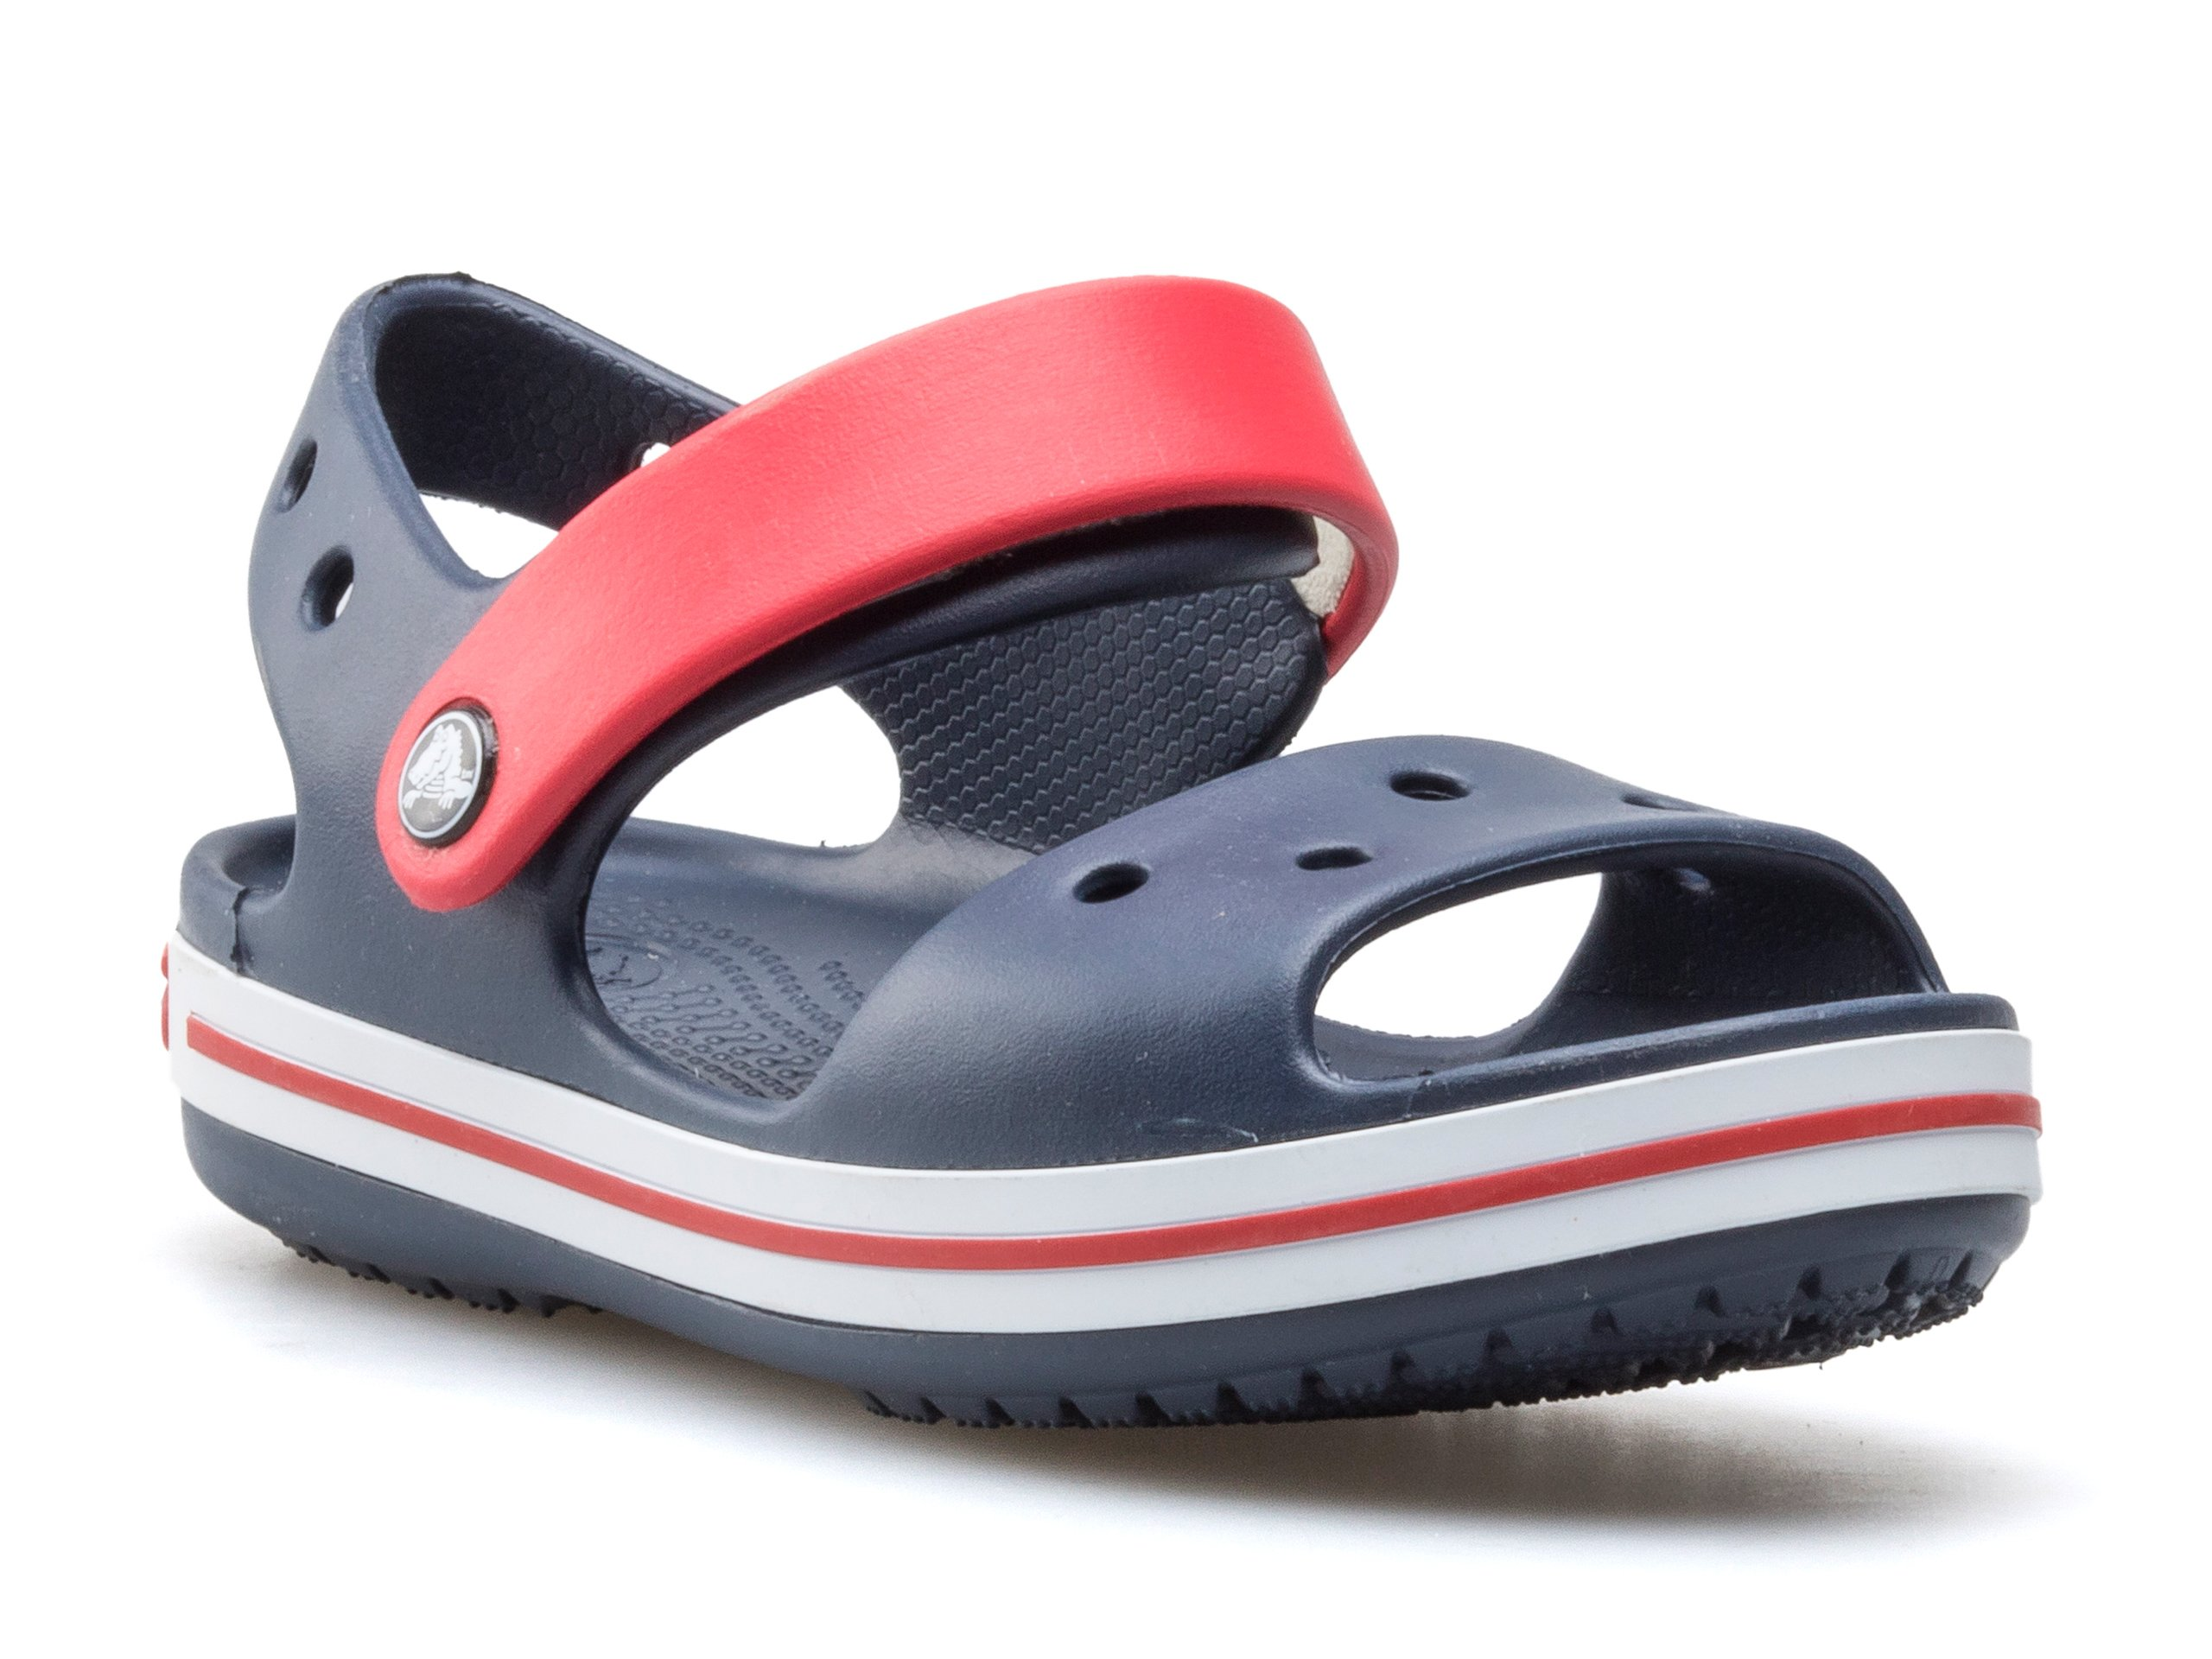 Sandały Crocs Crocband Sandal 12856 485 r. 19 20